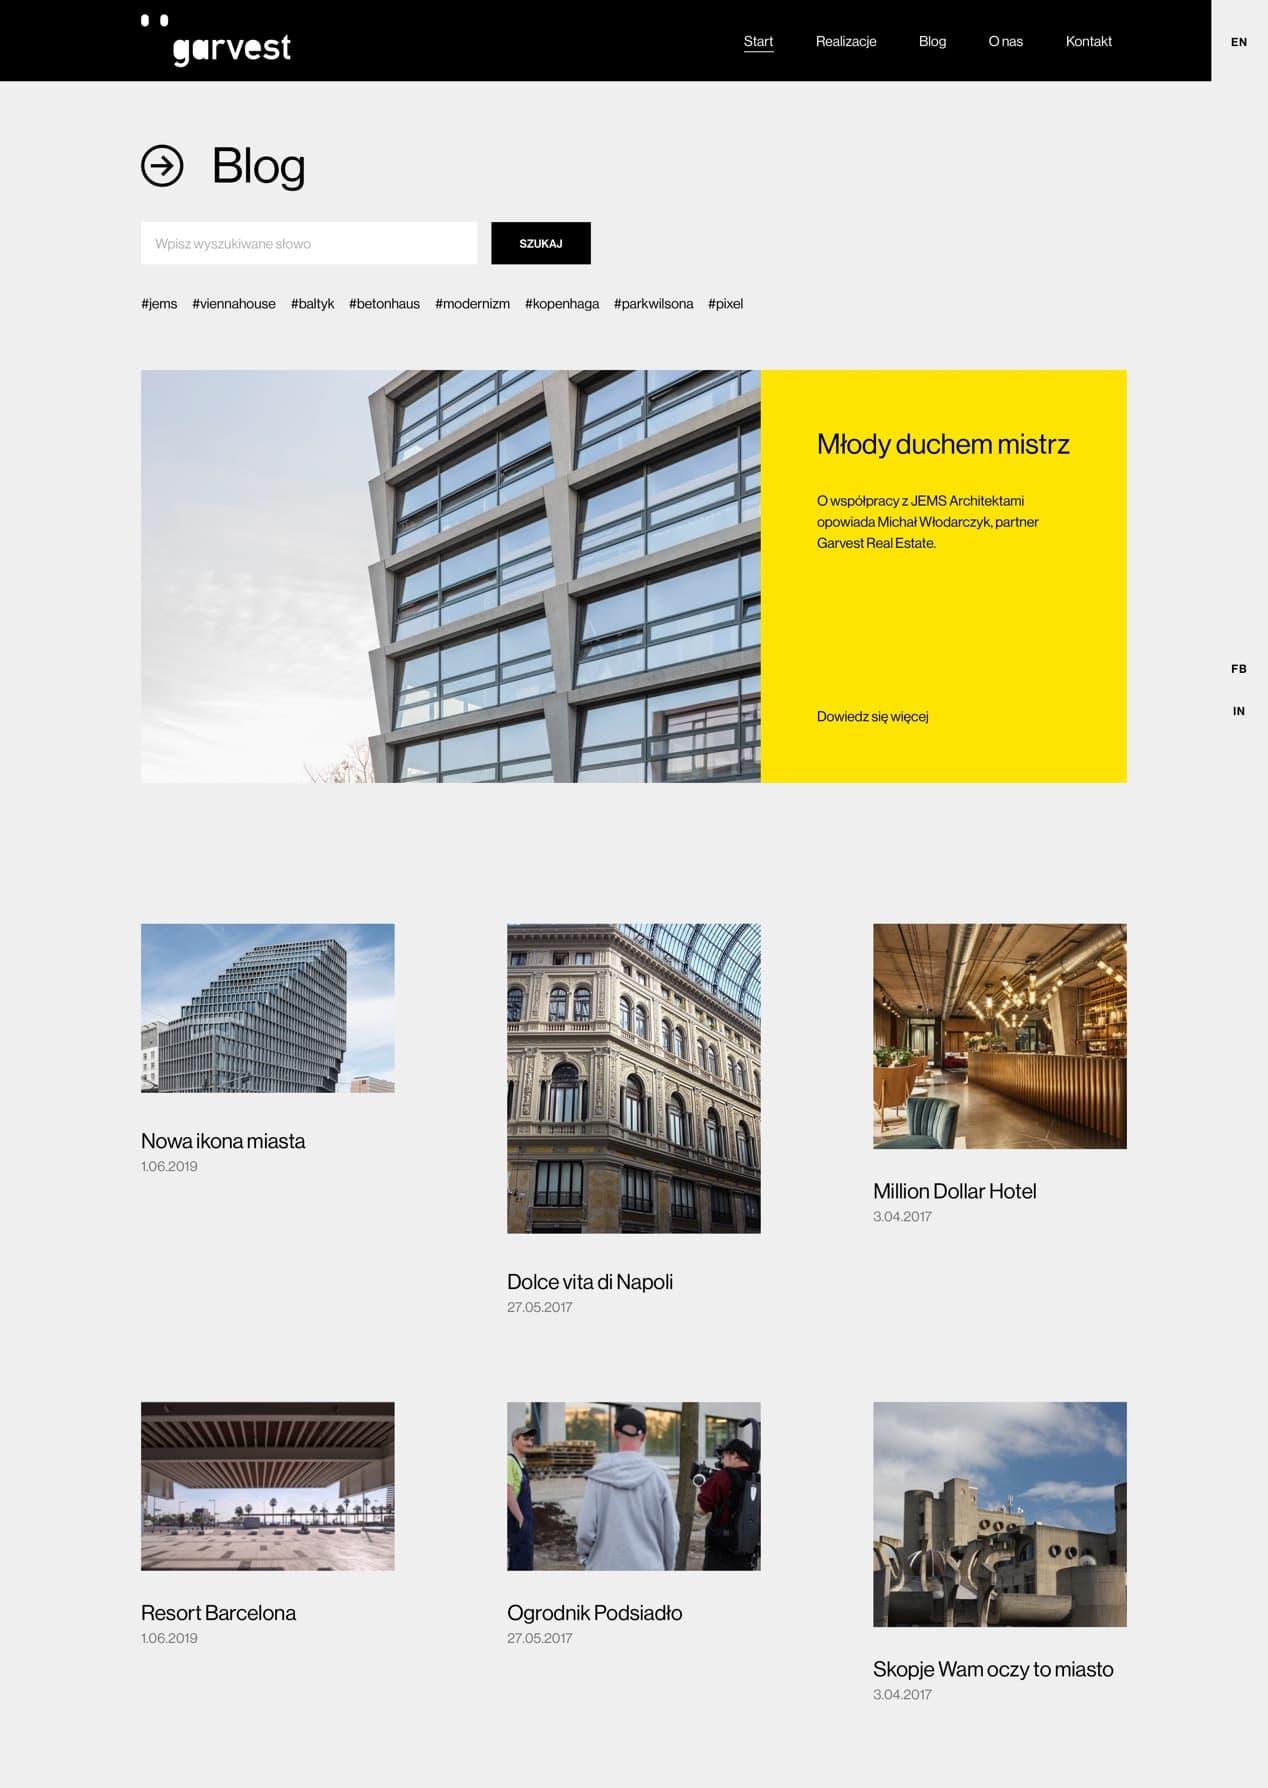 Garvest by Maciej Mach - UI/UX designer / Poland / Poznań